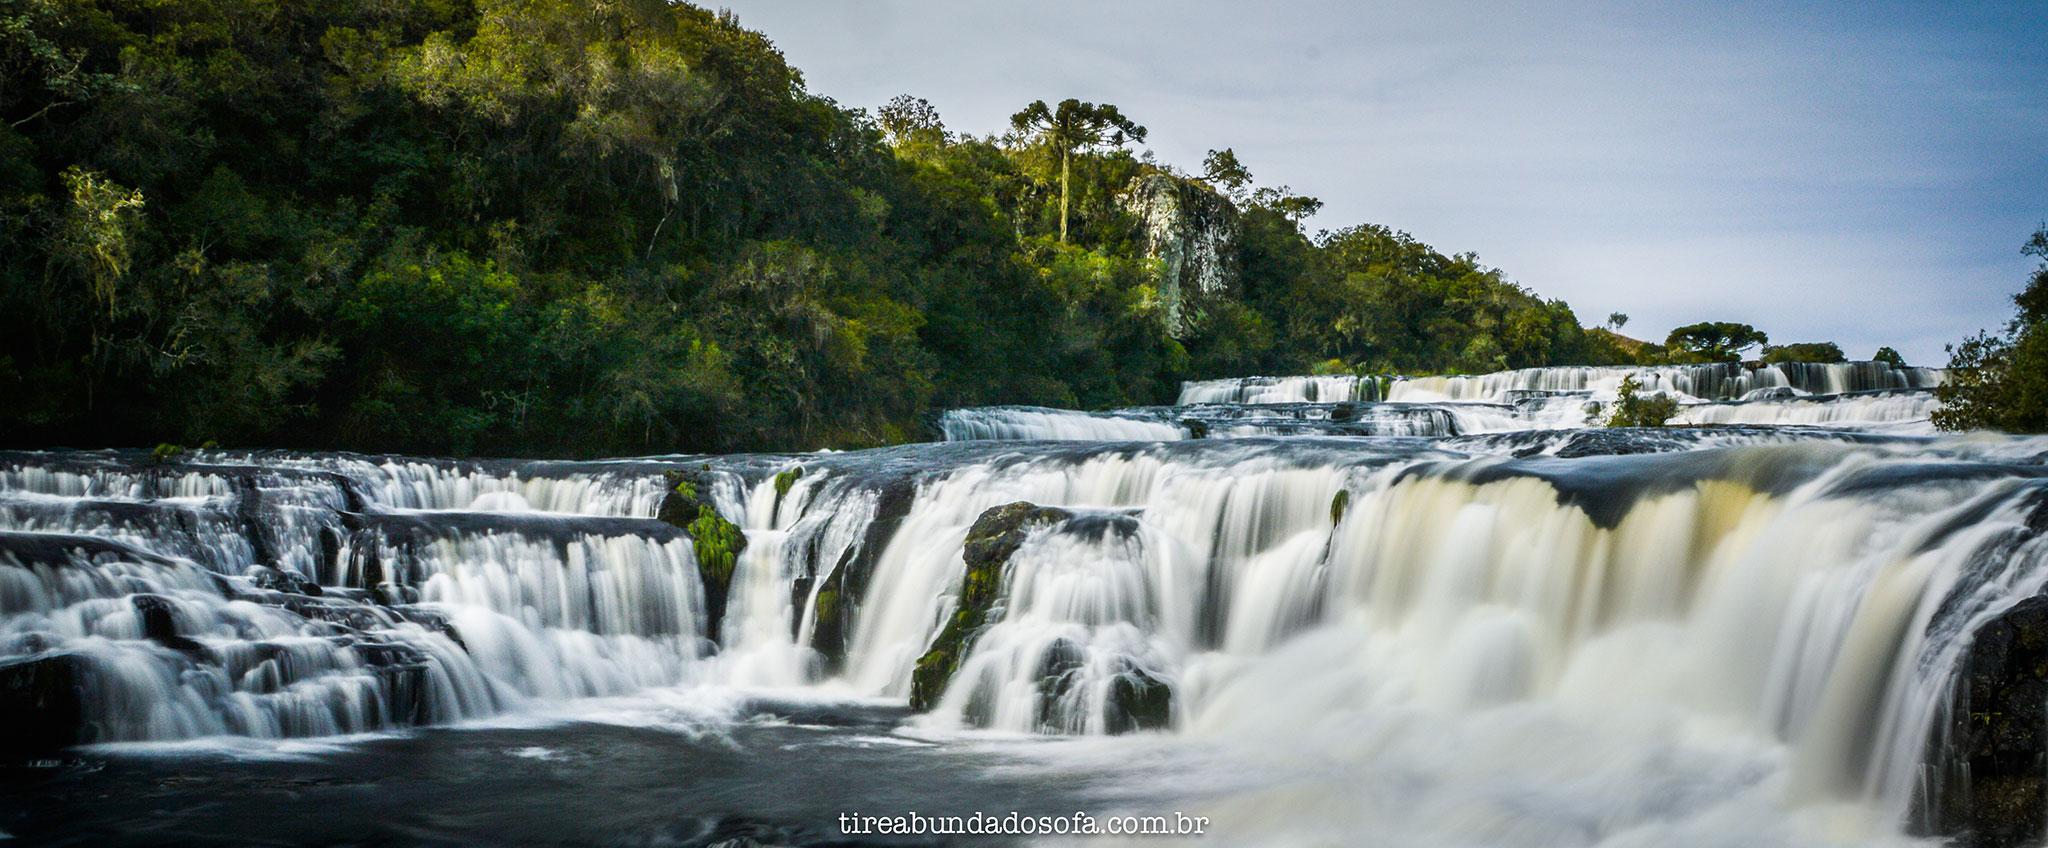 cachoeira dos venâncios, cambará do sul, rio grande do sul, fazenda dos venâncios, , o que fazer em cambará do sul